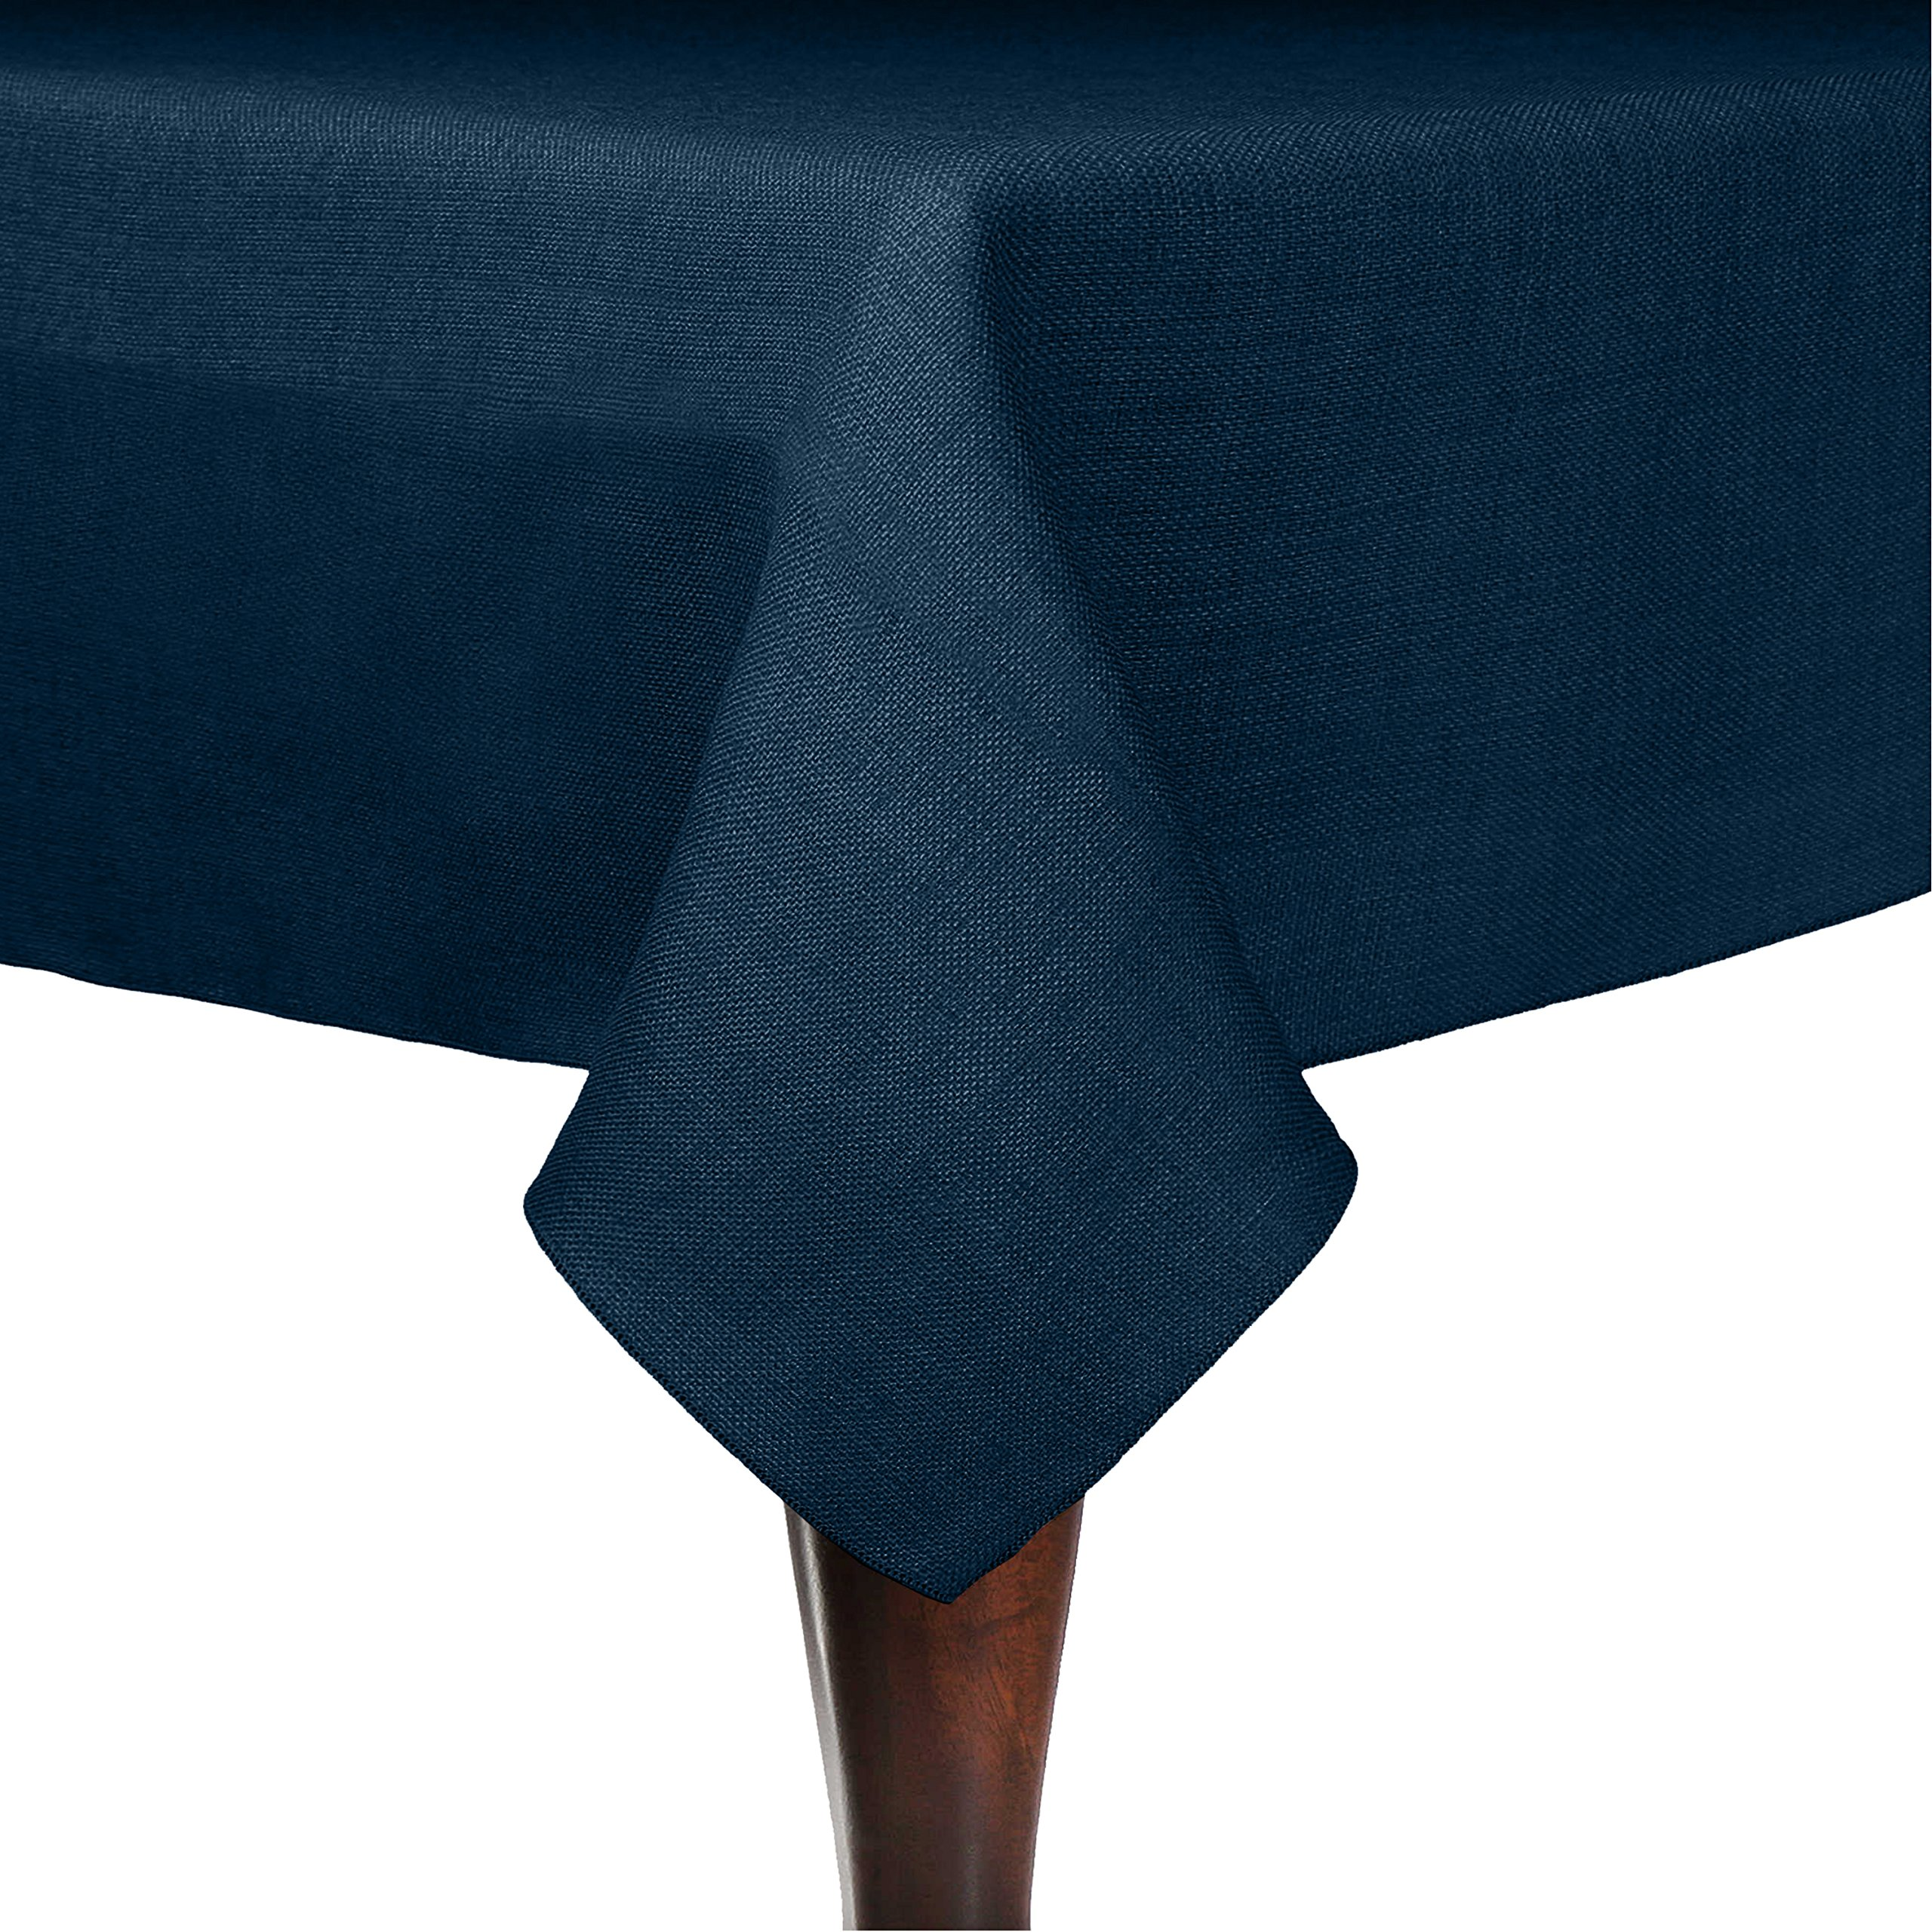 Ultimate Textile (25 Pack) Faux Burlap - Havana 60 x 120-Inch Rectangular Tablecloth - Basket Weave, Navy Blue